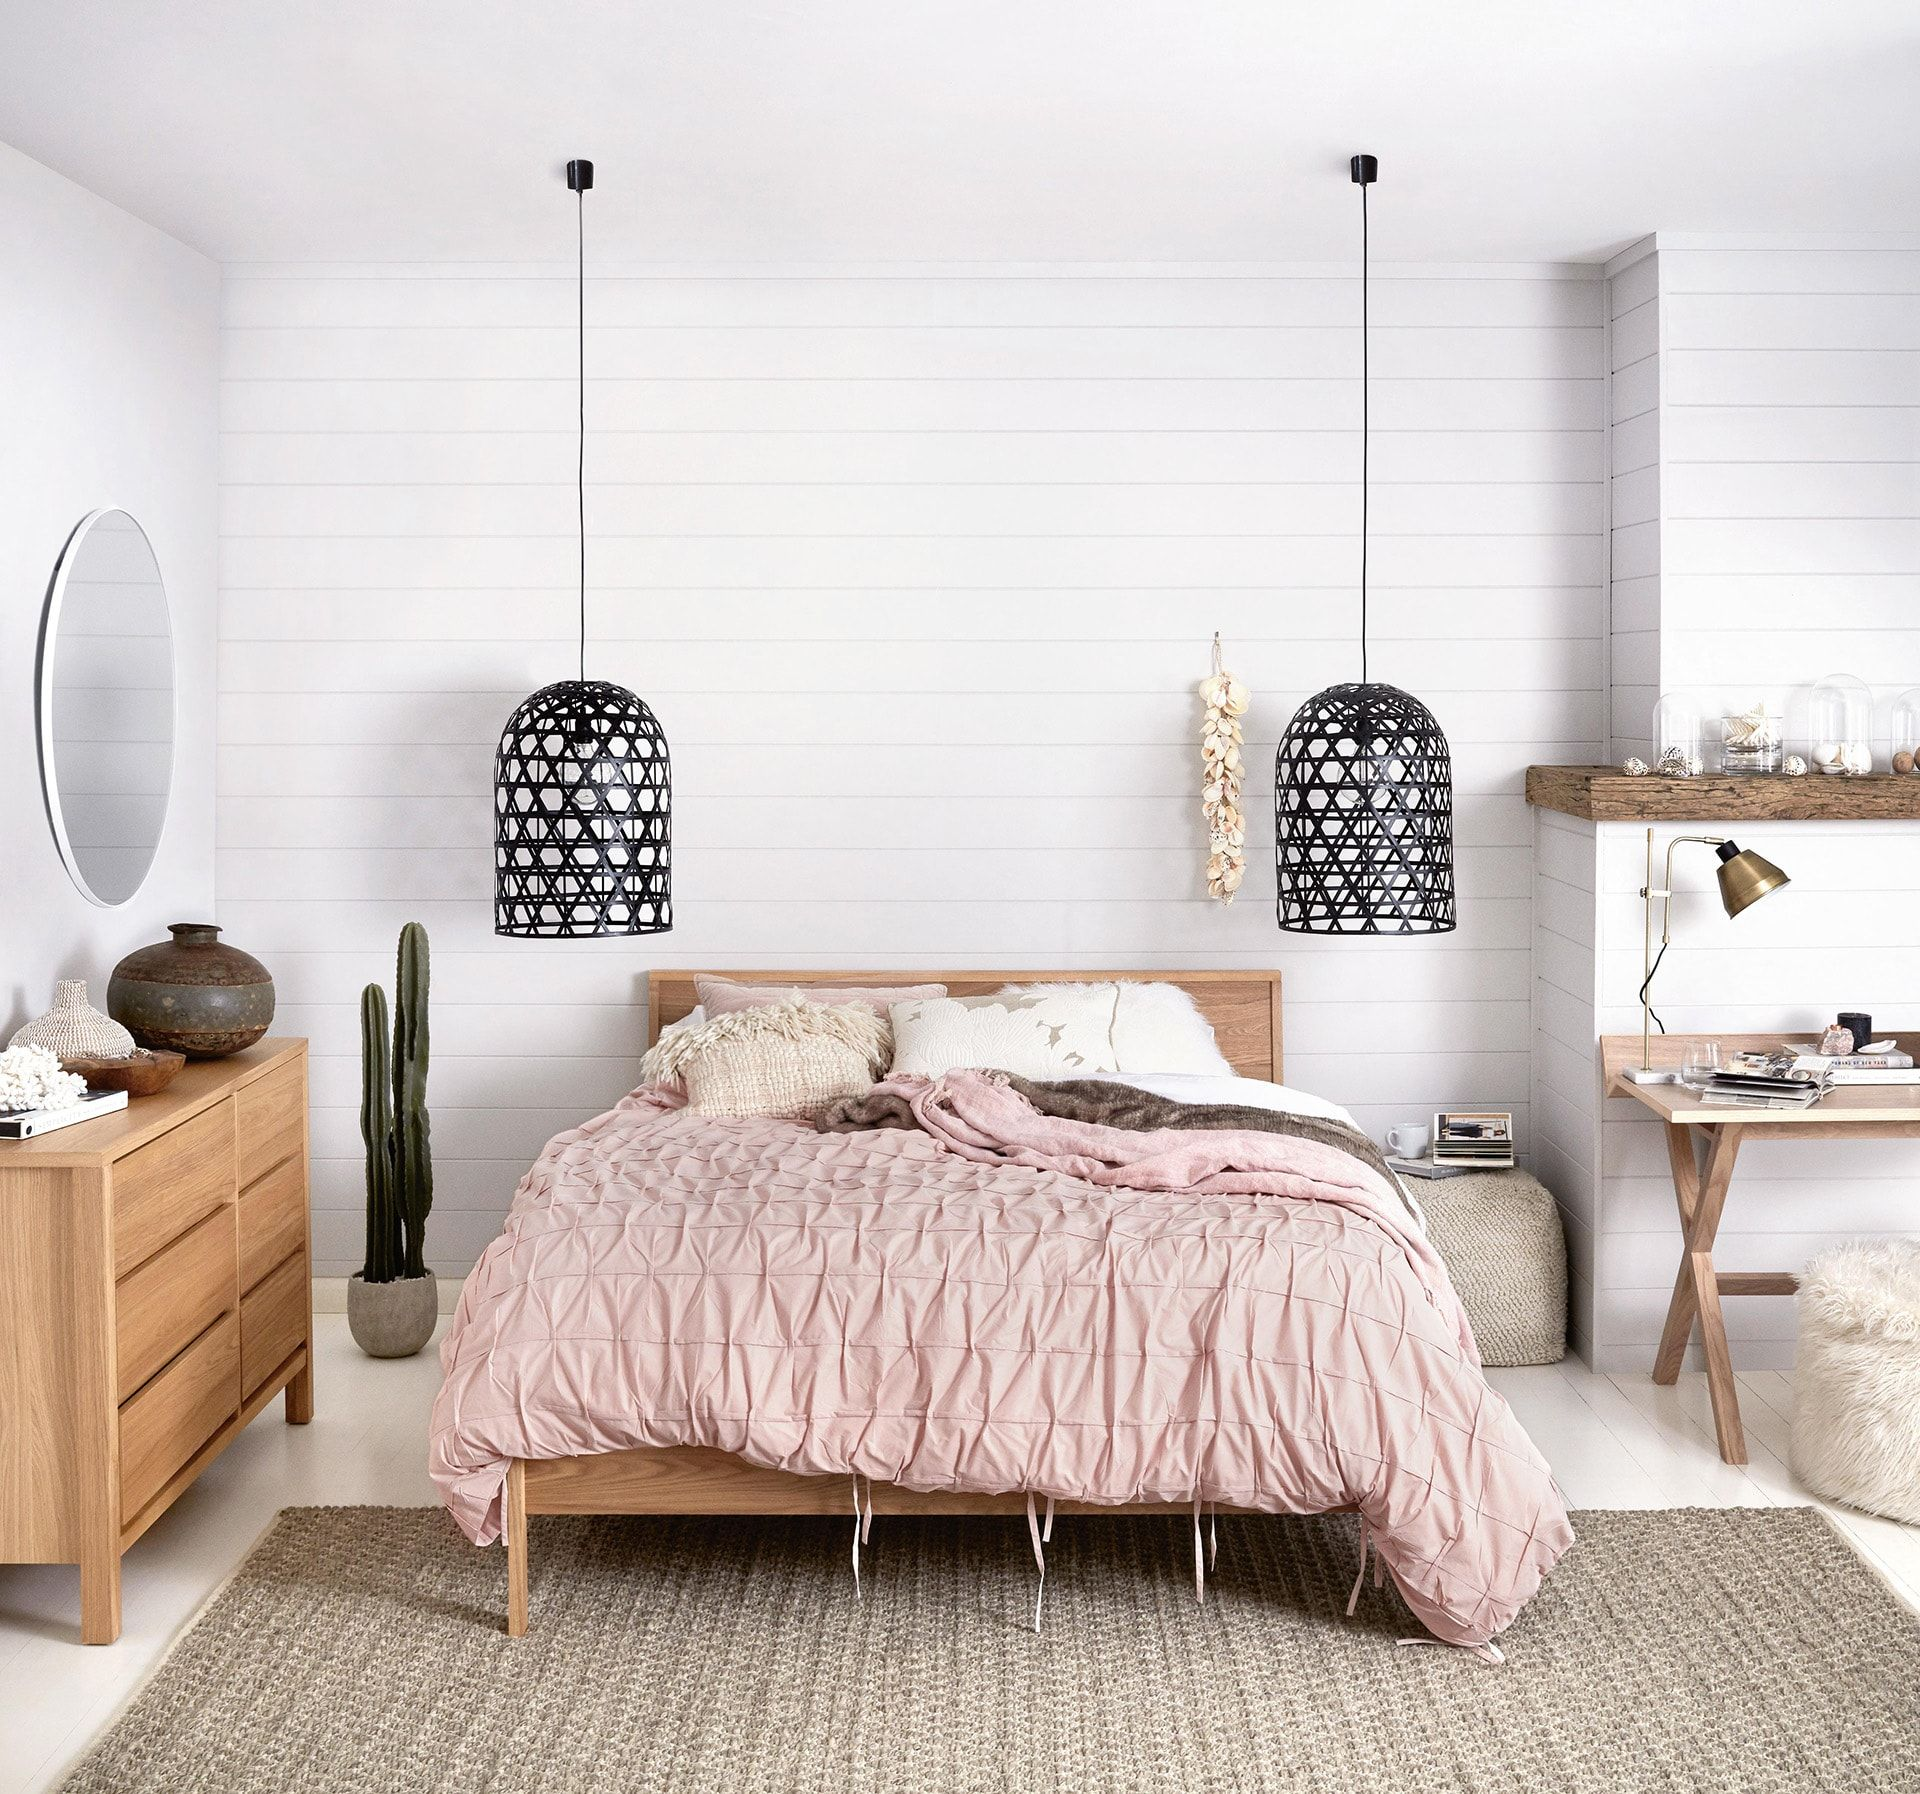 Cheats On Choosing Pendant Lights For A Master Bedroom Tlc Interiors Master Bedroom Lighting King Single Bed Single Bed Frame